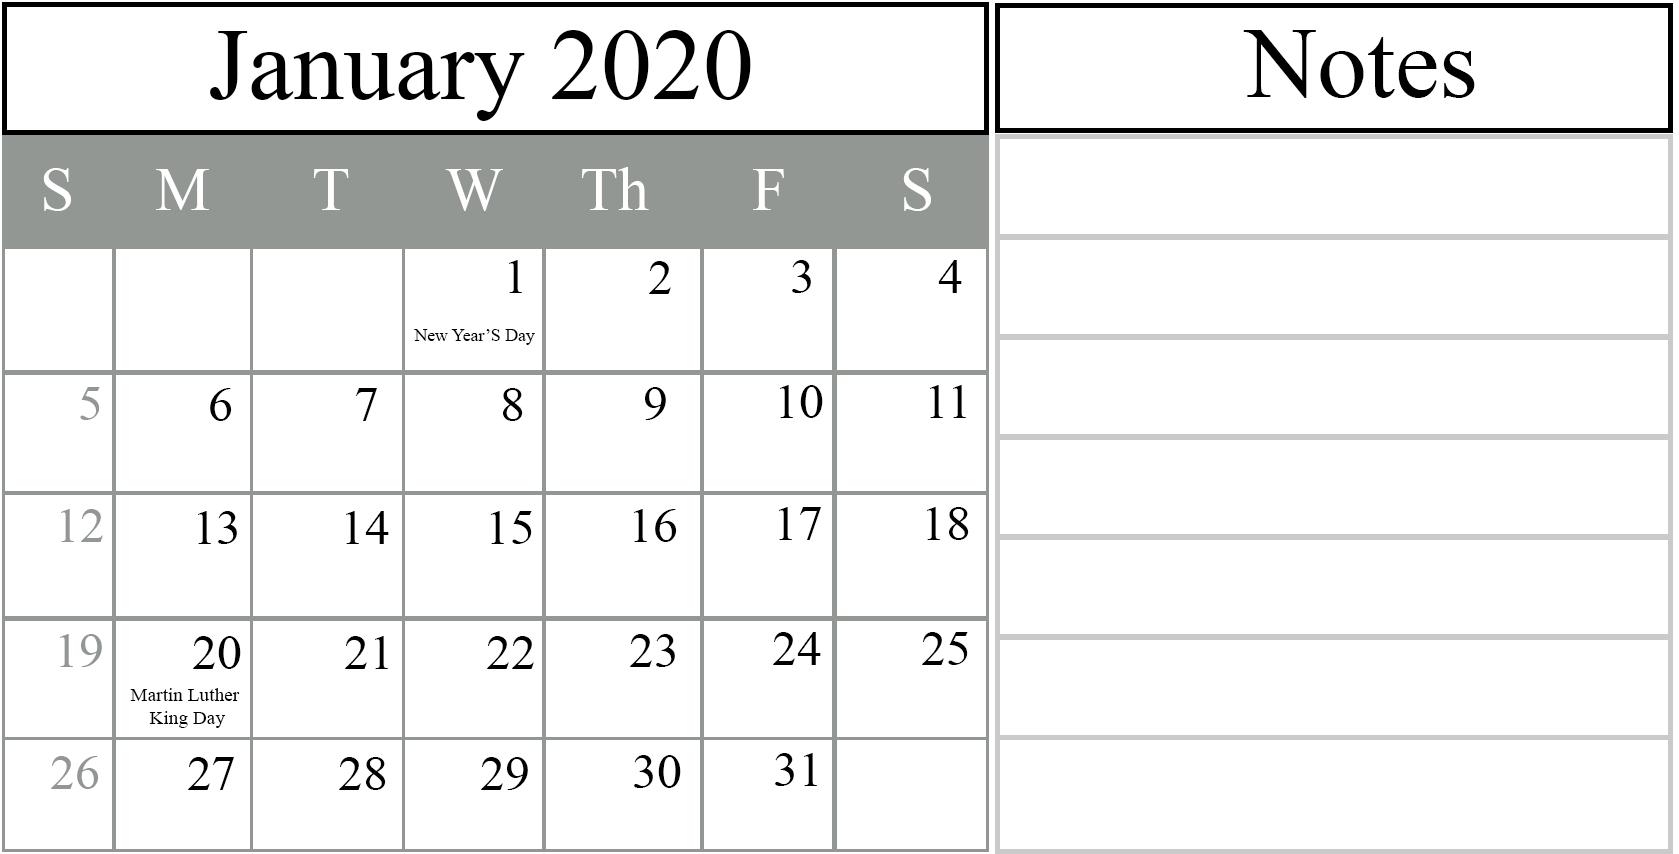 Free January 2020 Printable Calendar Blank In Pdf, Excel